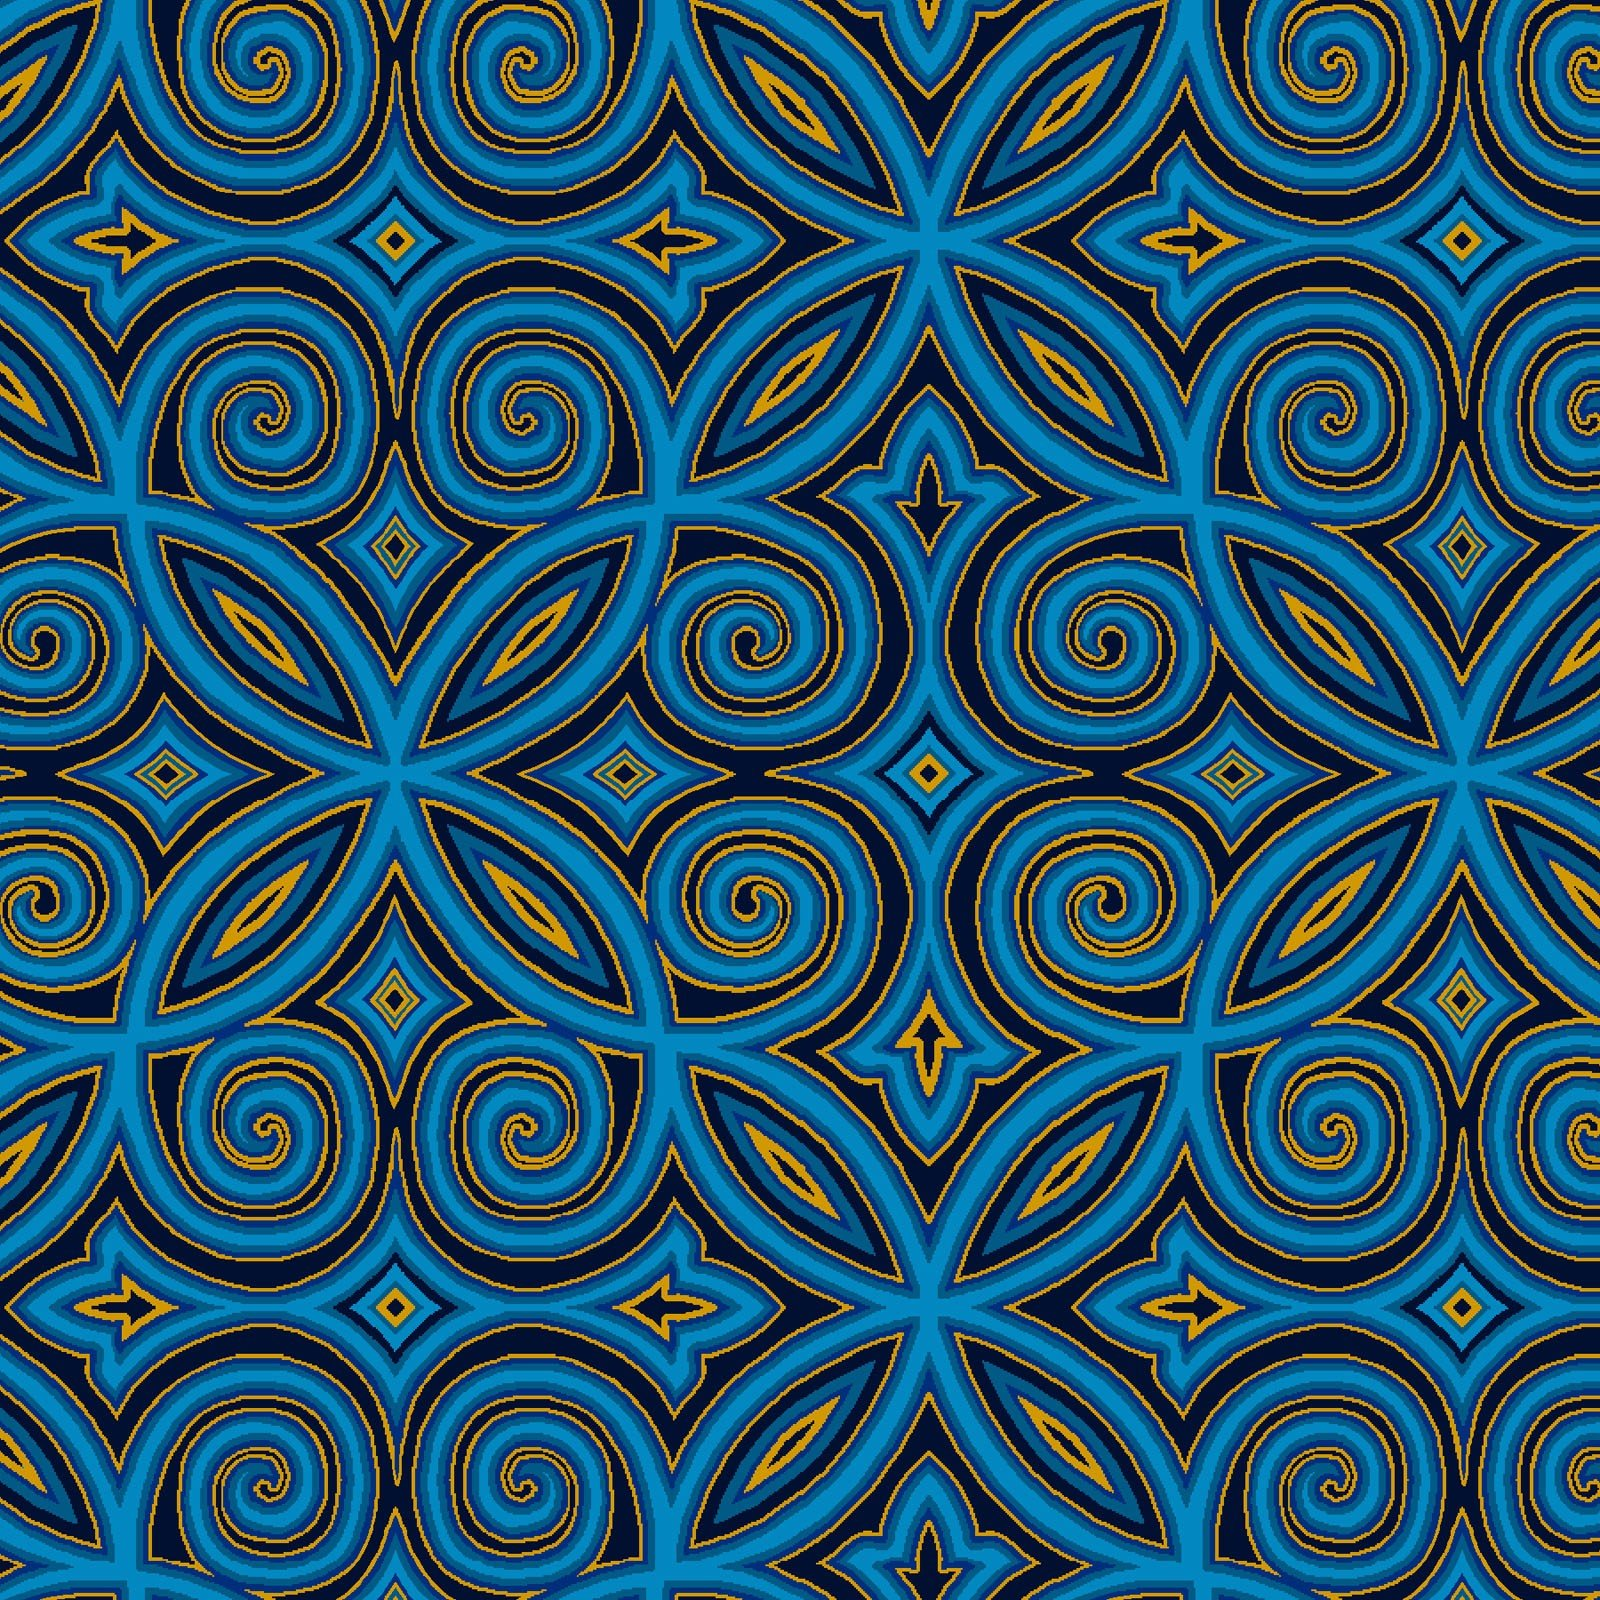 Arabesque Blue<br/>Henry Glass 2510M-77